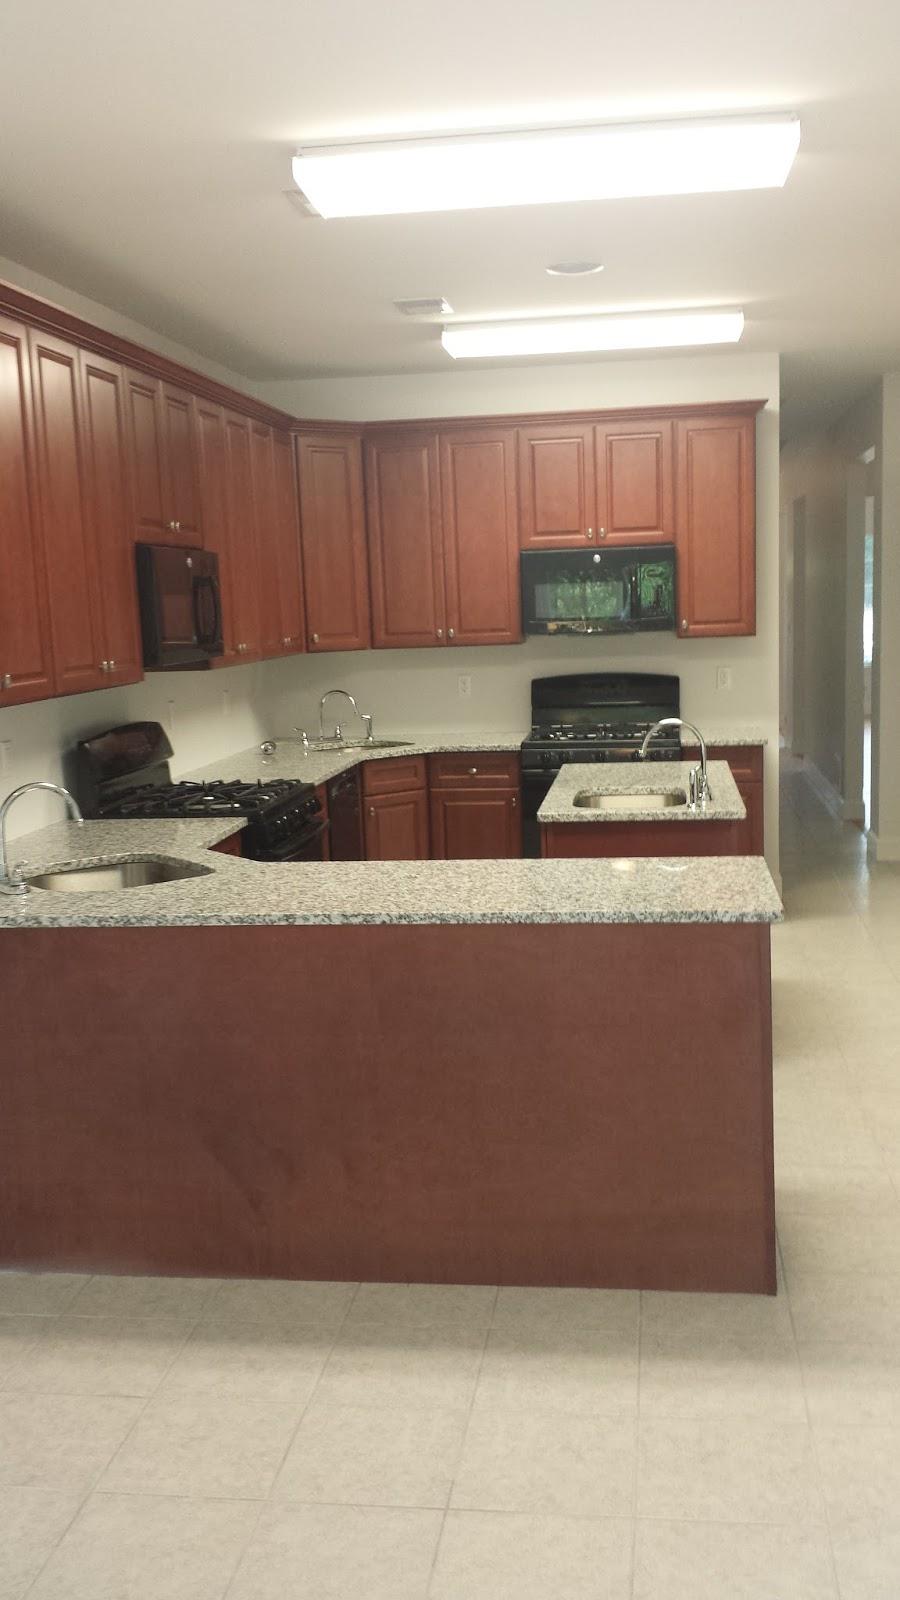 424 5th Street Lakewood Nj 08701